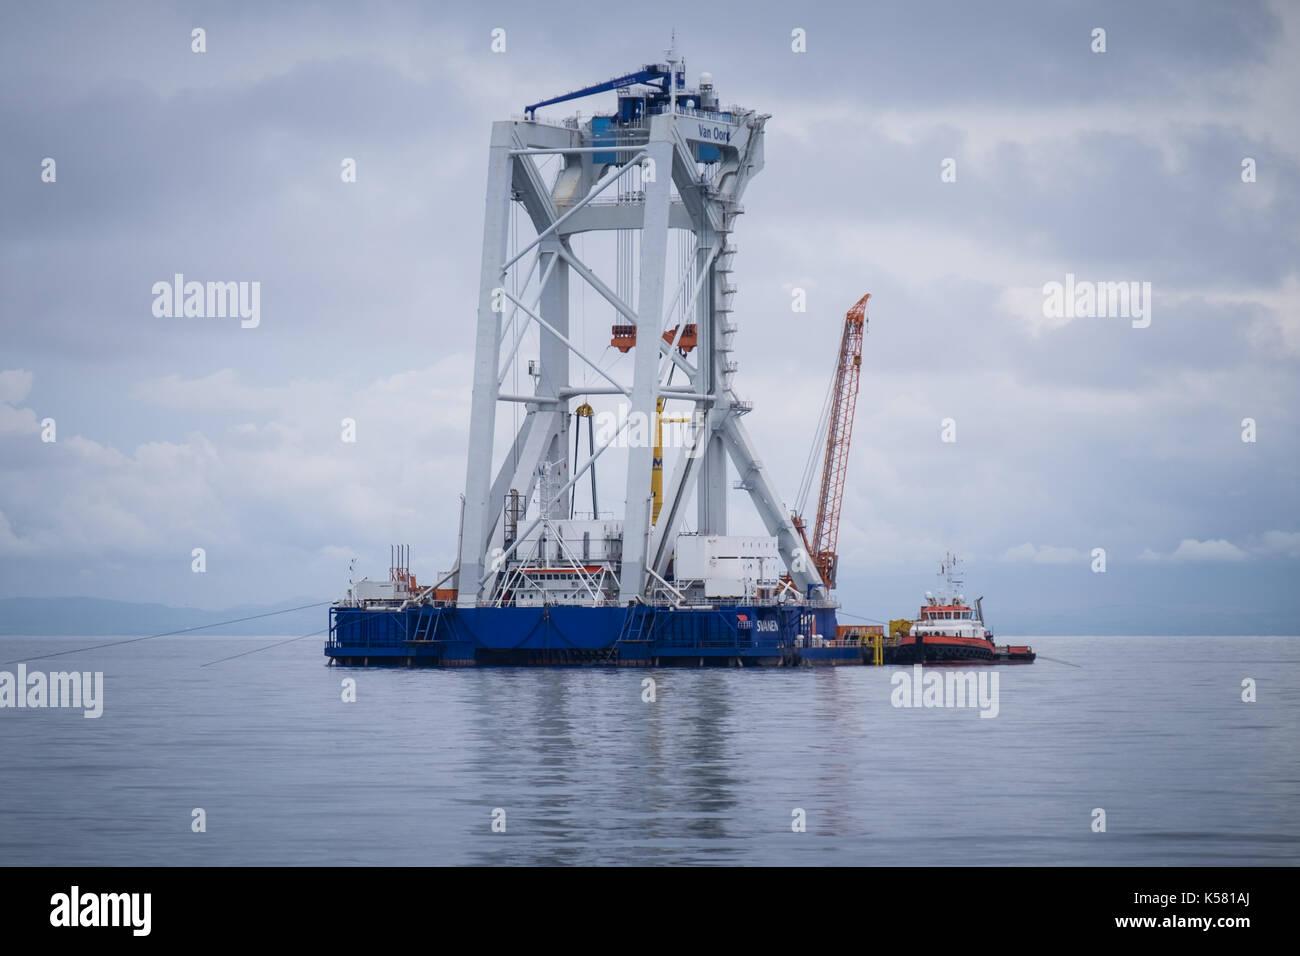 The Van Oord heavy lift vessel, Svanen, on Walney Extension Offshore Wind Farm - Stock Image